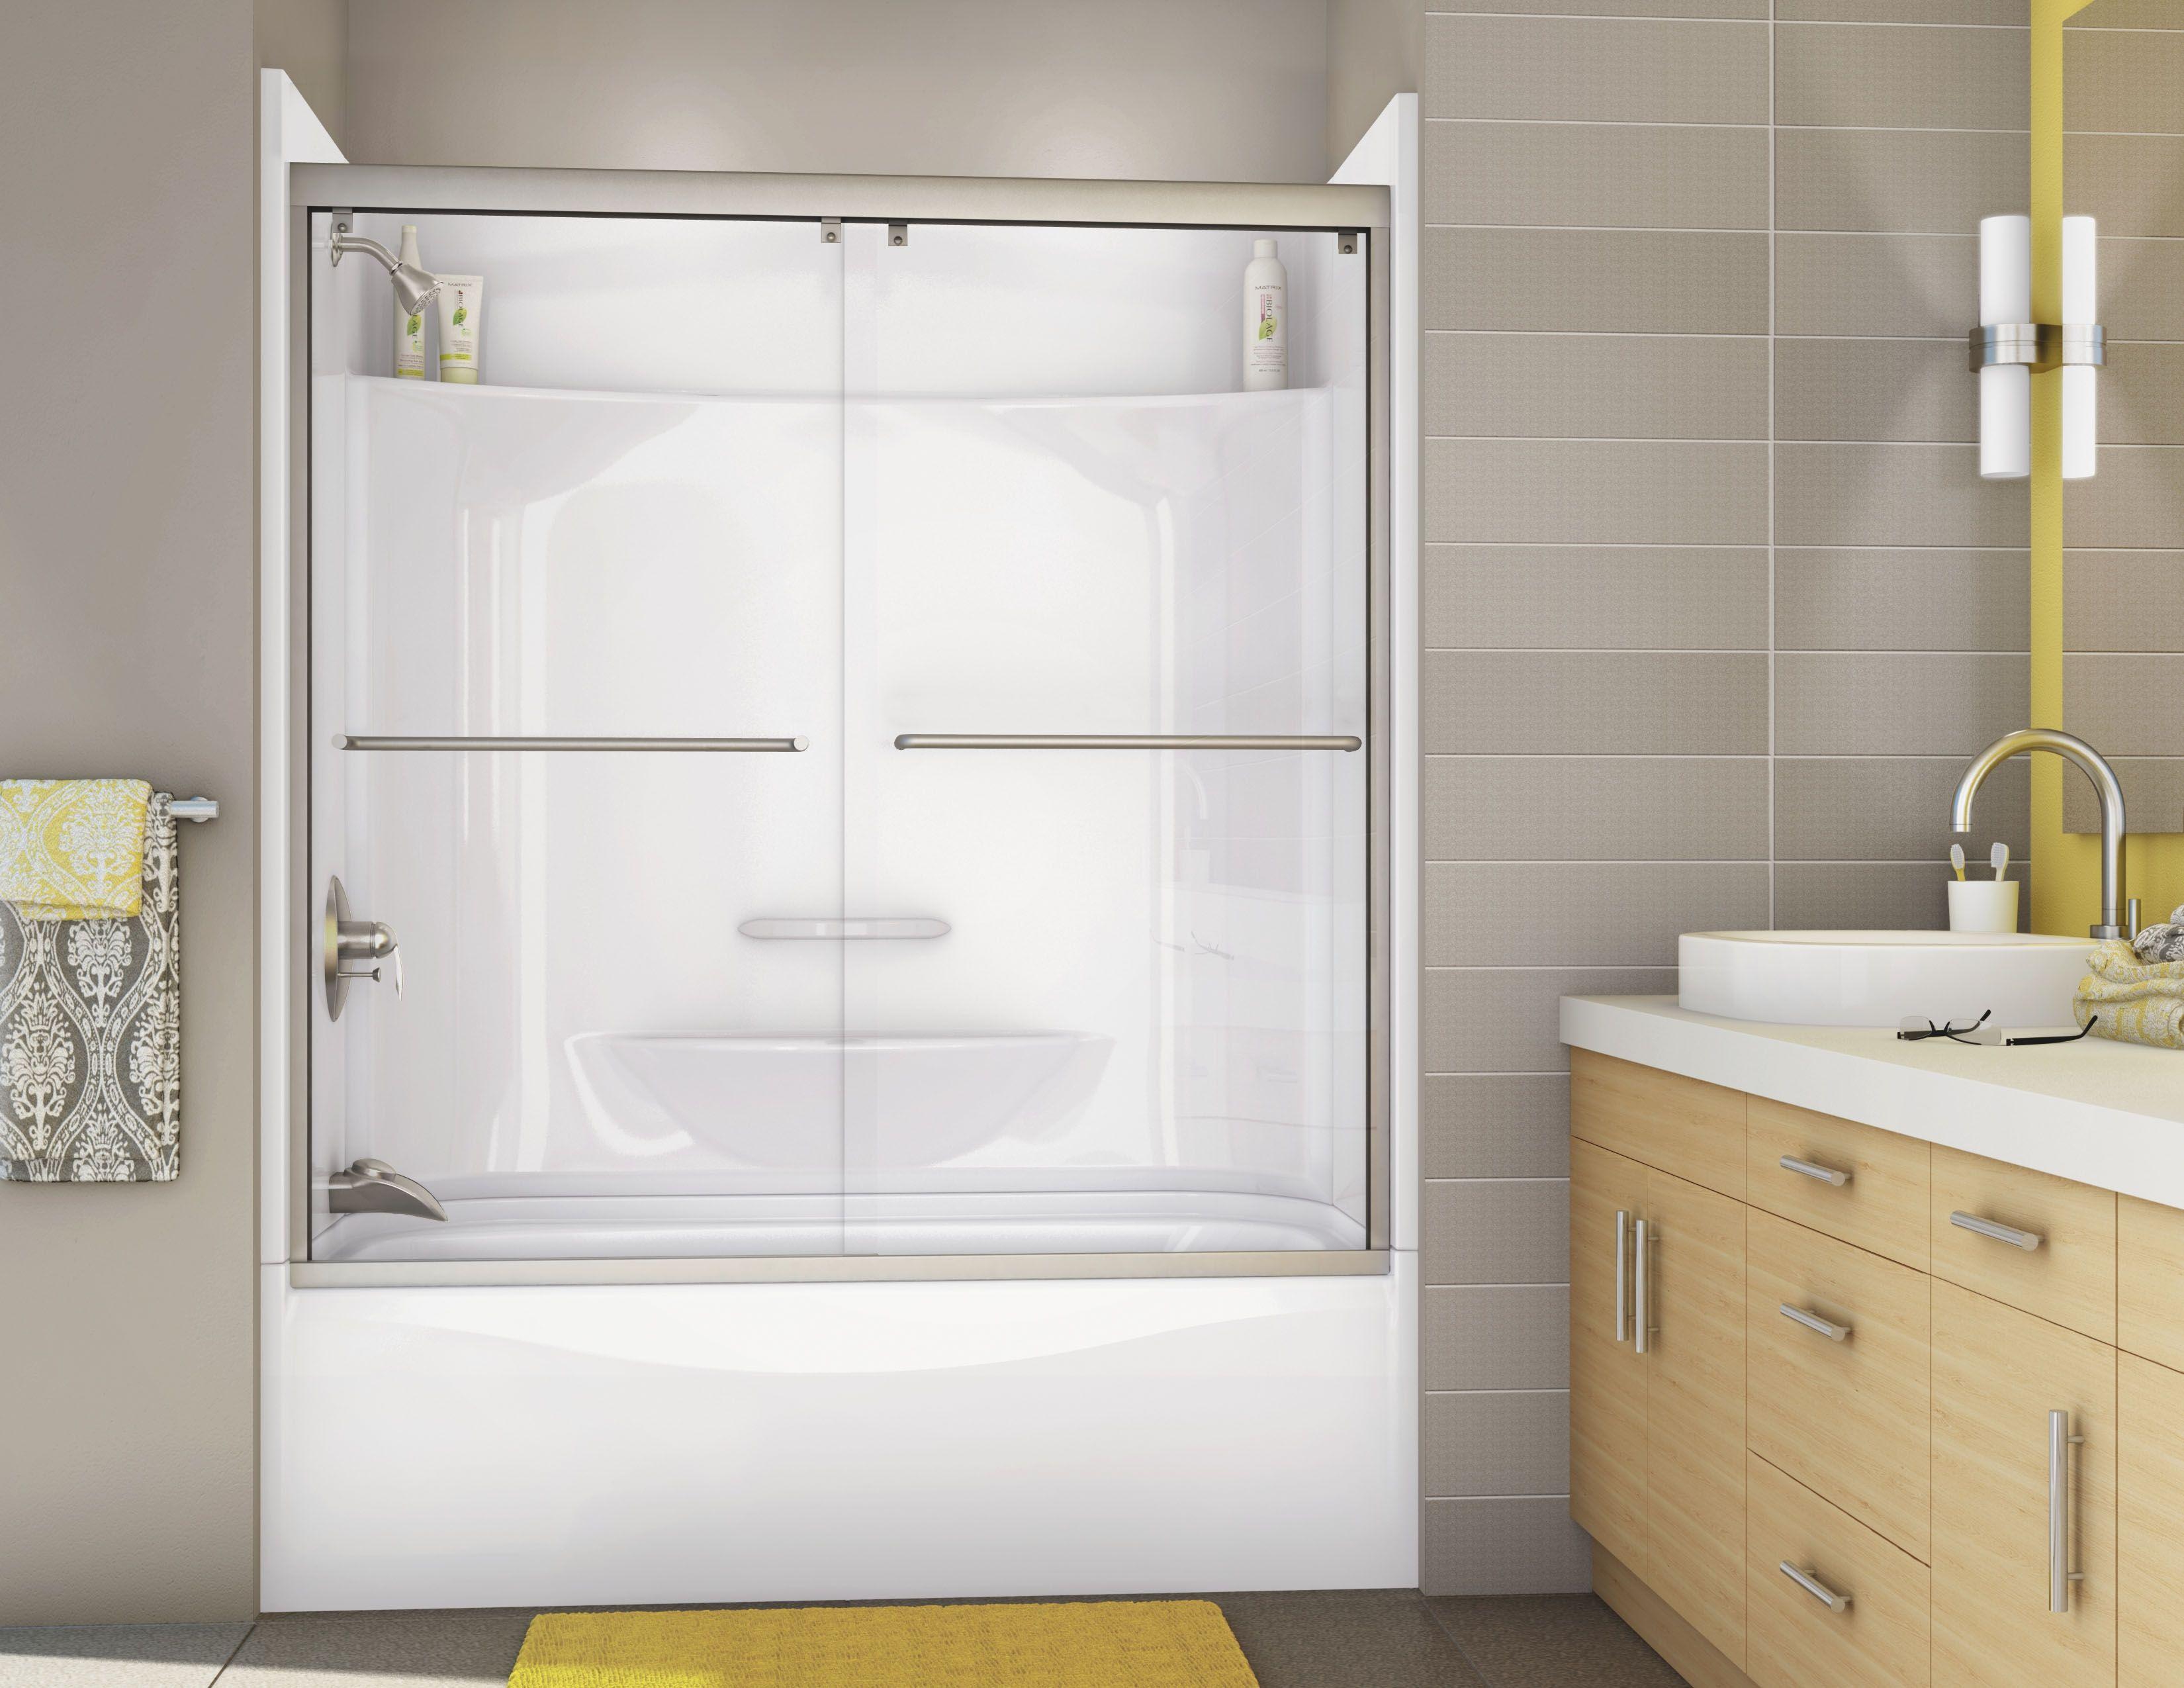 Shower Doors For Fiberglass Showers Httpsourceabl